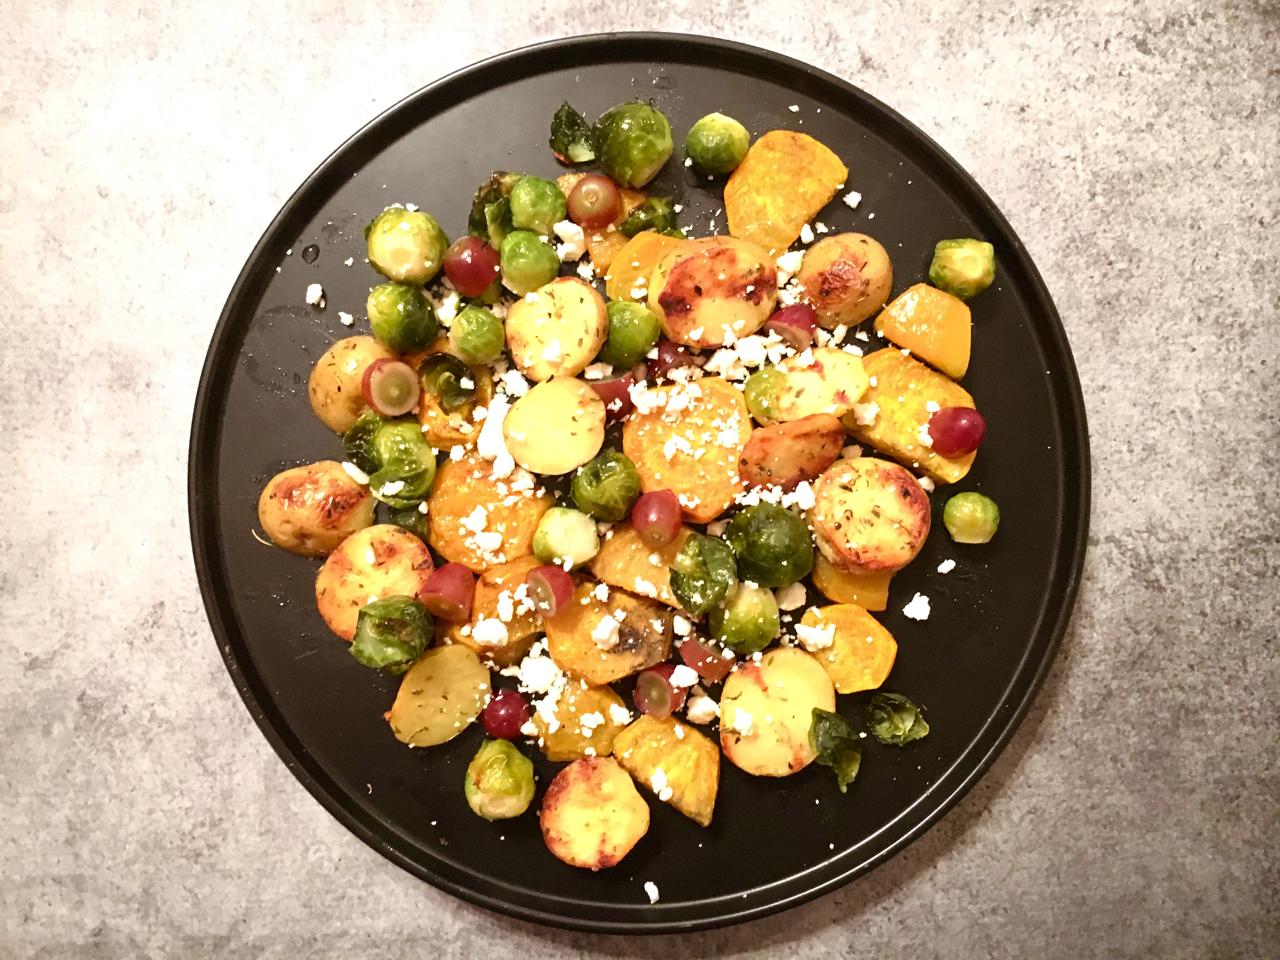 autumn-roasted-veggies-with-feta